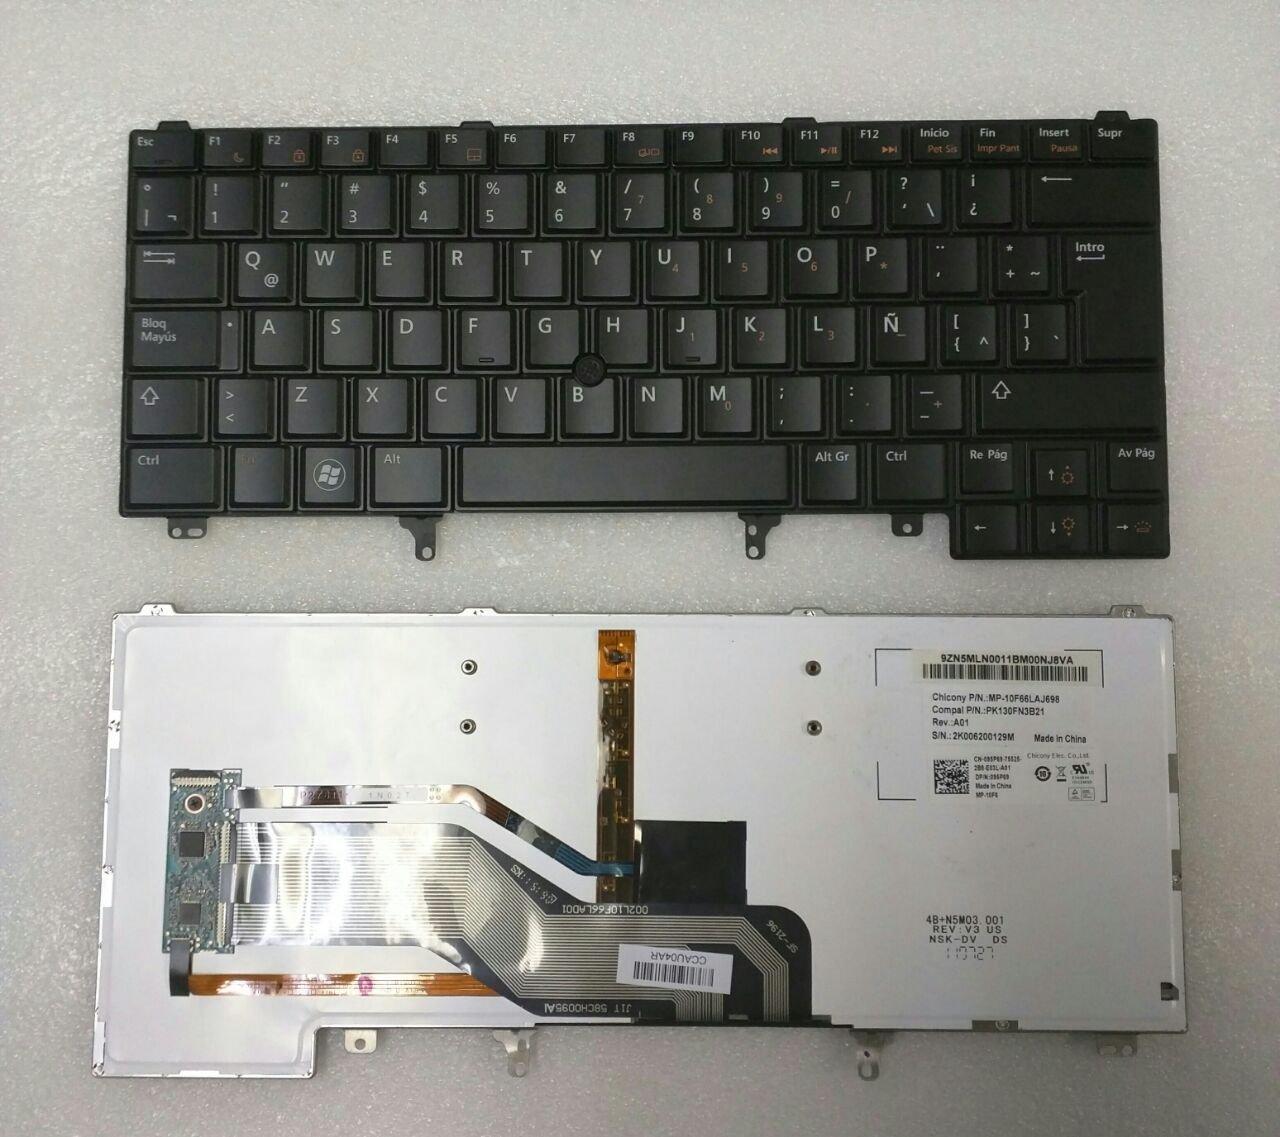 Keyboard for Dell Latitude E5420 E5430 E6220 E6230 E6320 E6330 E6420 E6430 E6440